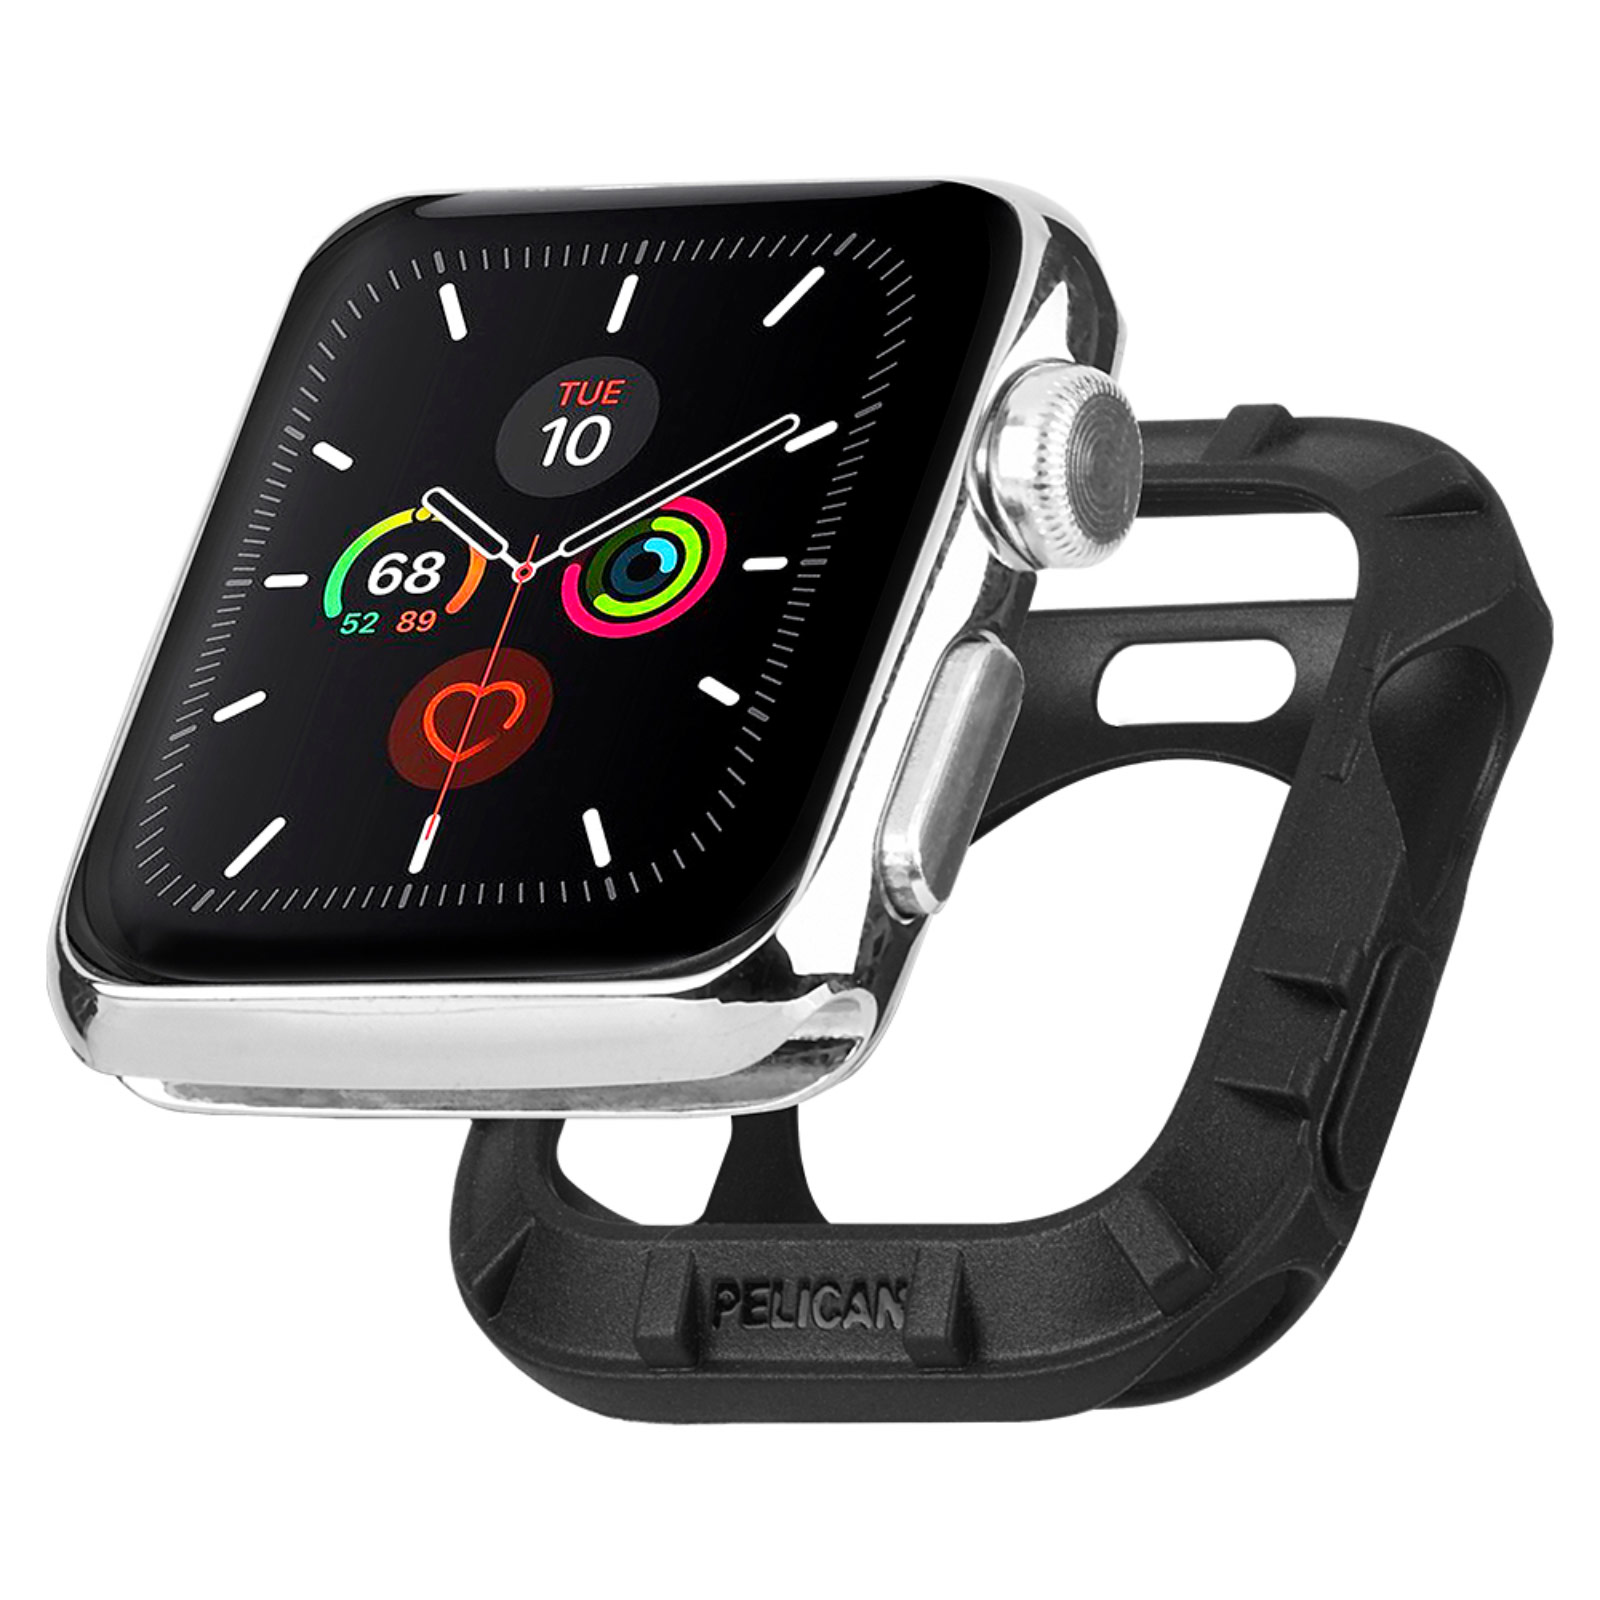 pelican pp043396 protector apple watch bumper black 42mm